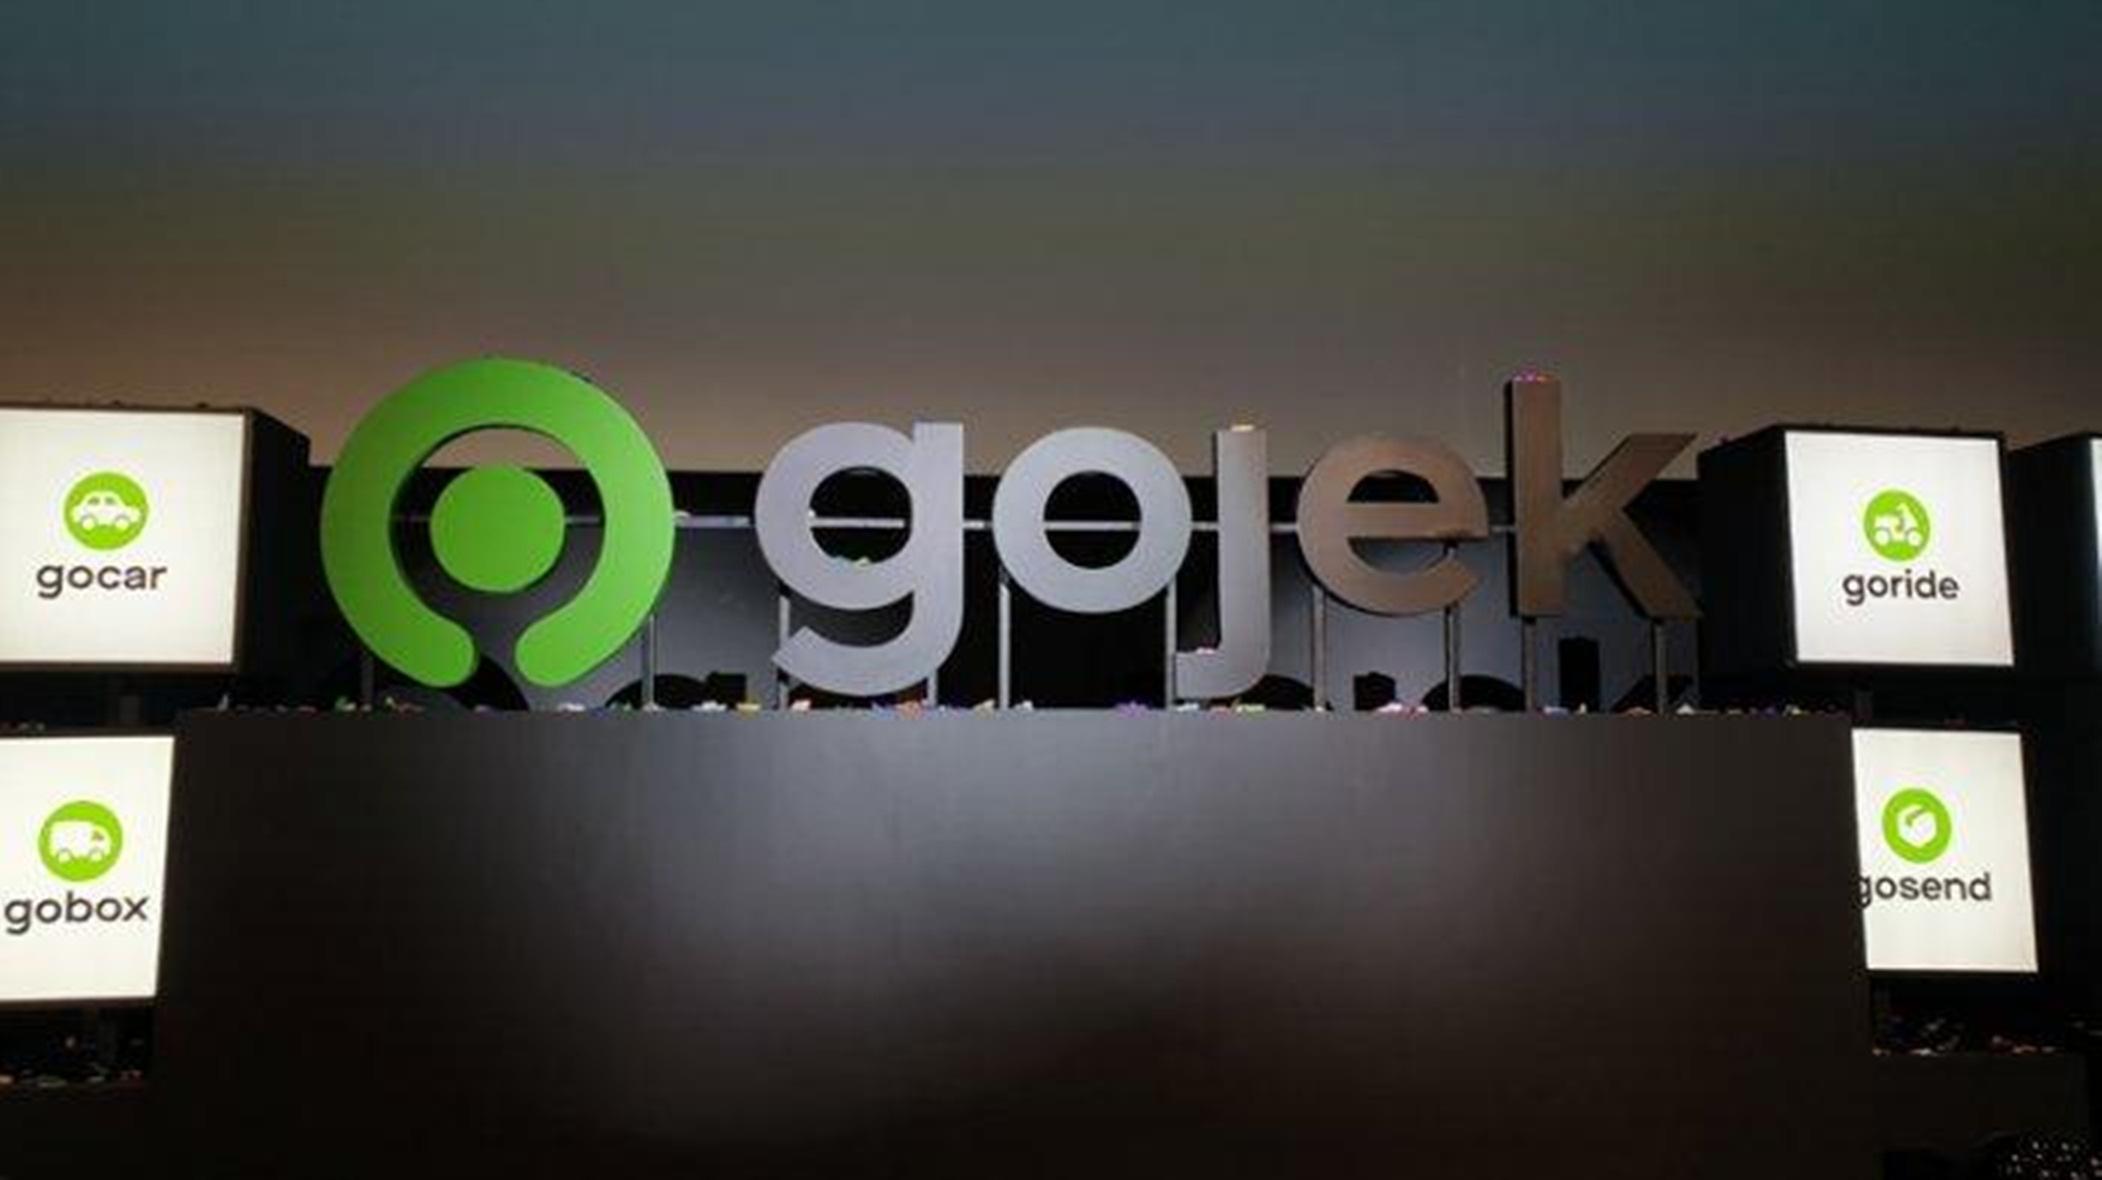 Gojek Sekarang Dengan Logo Baru, Ini Maknanya 4